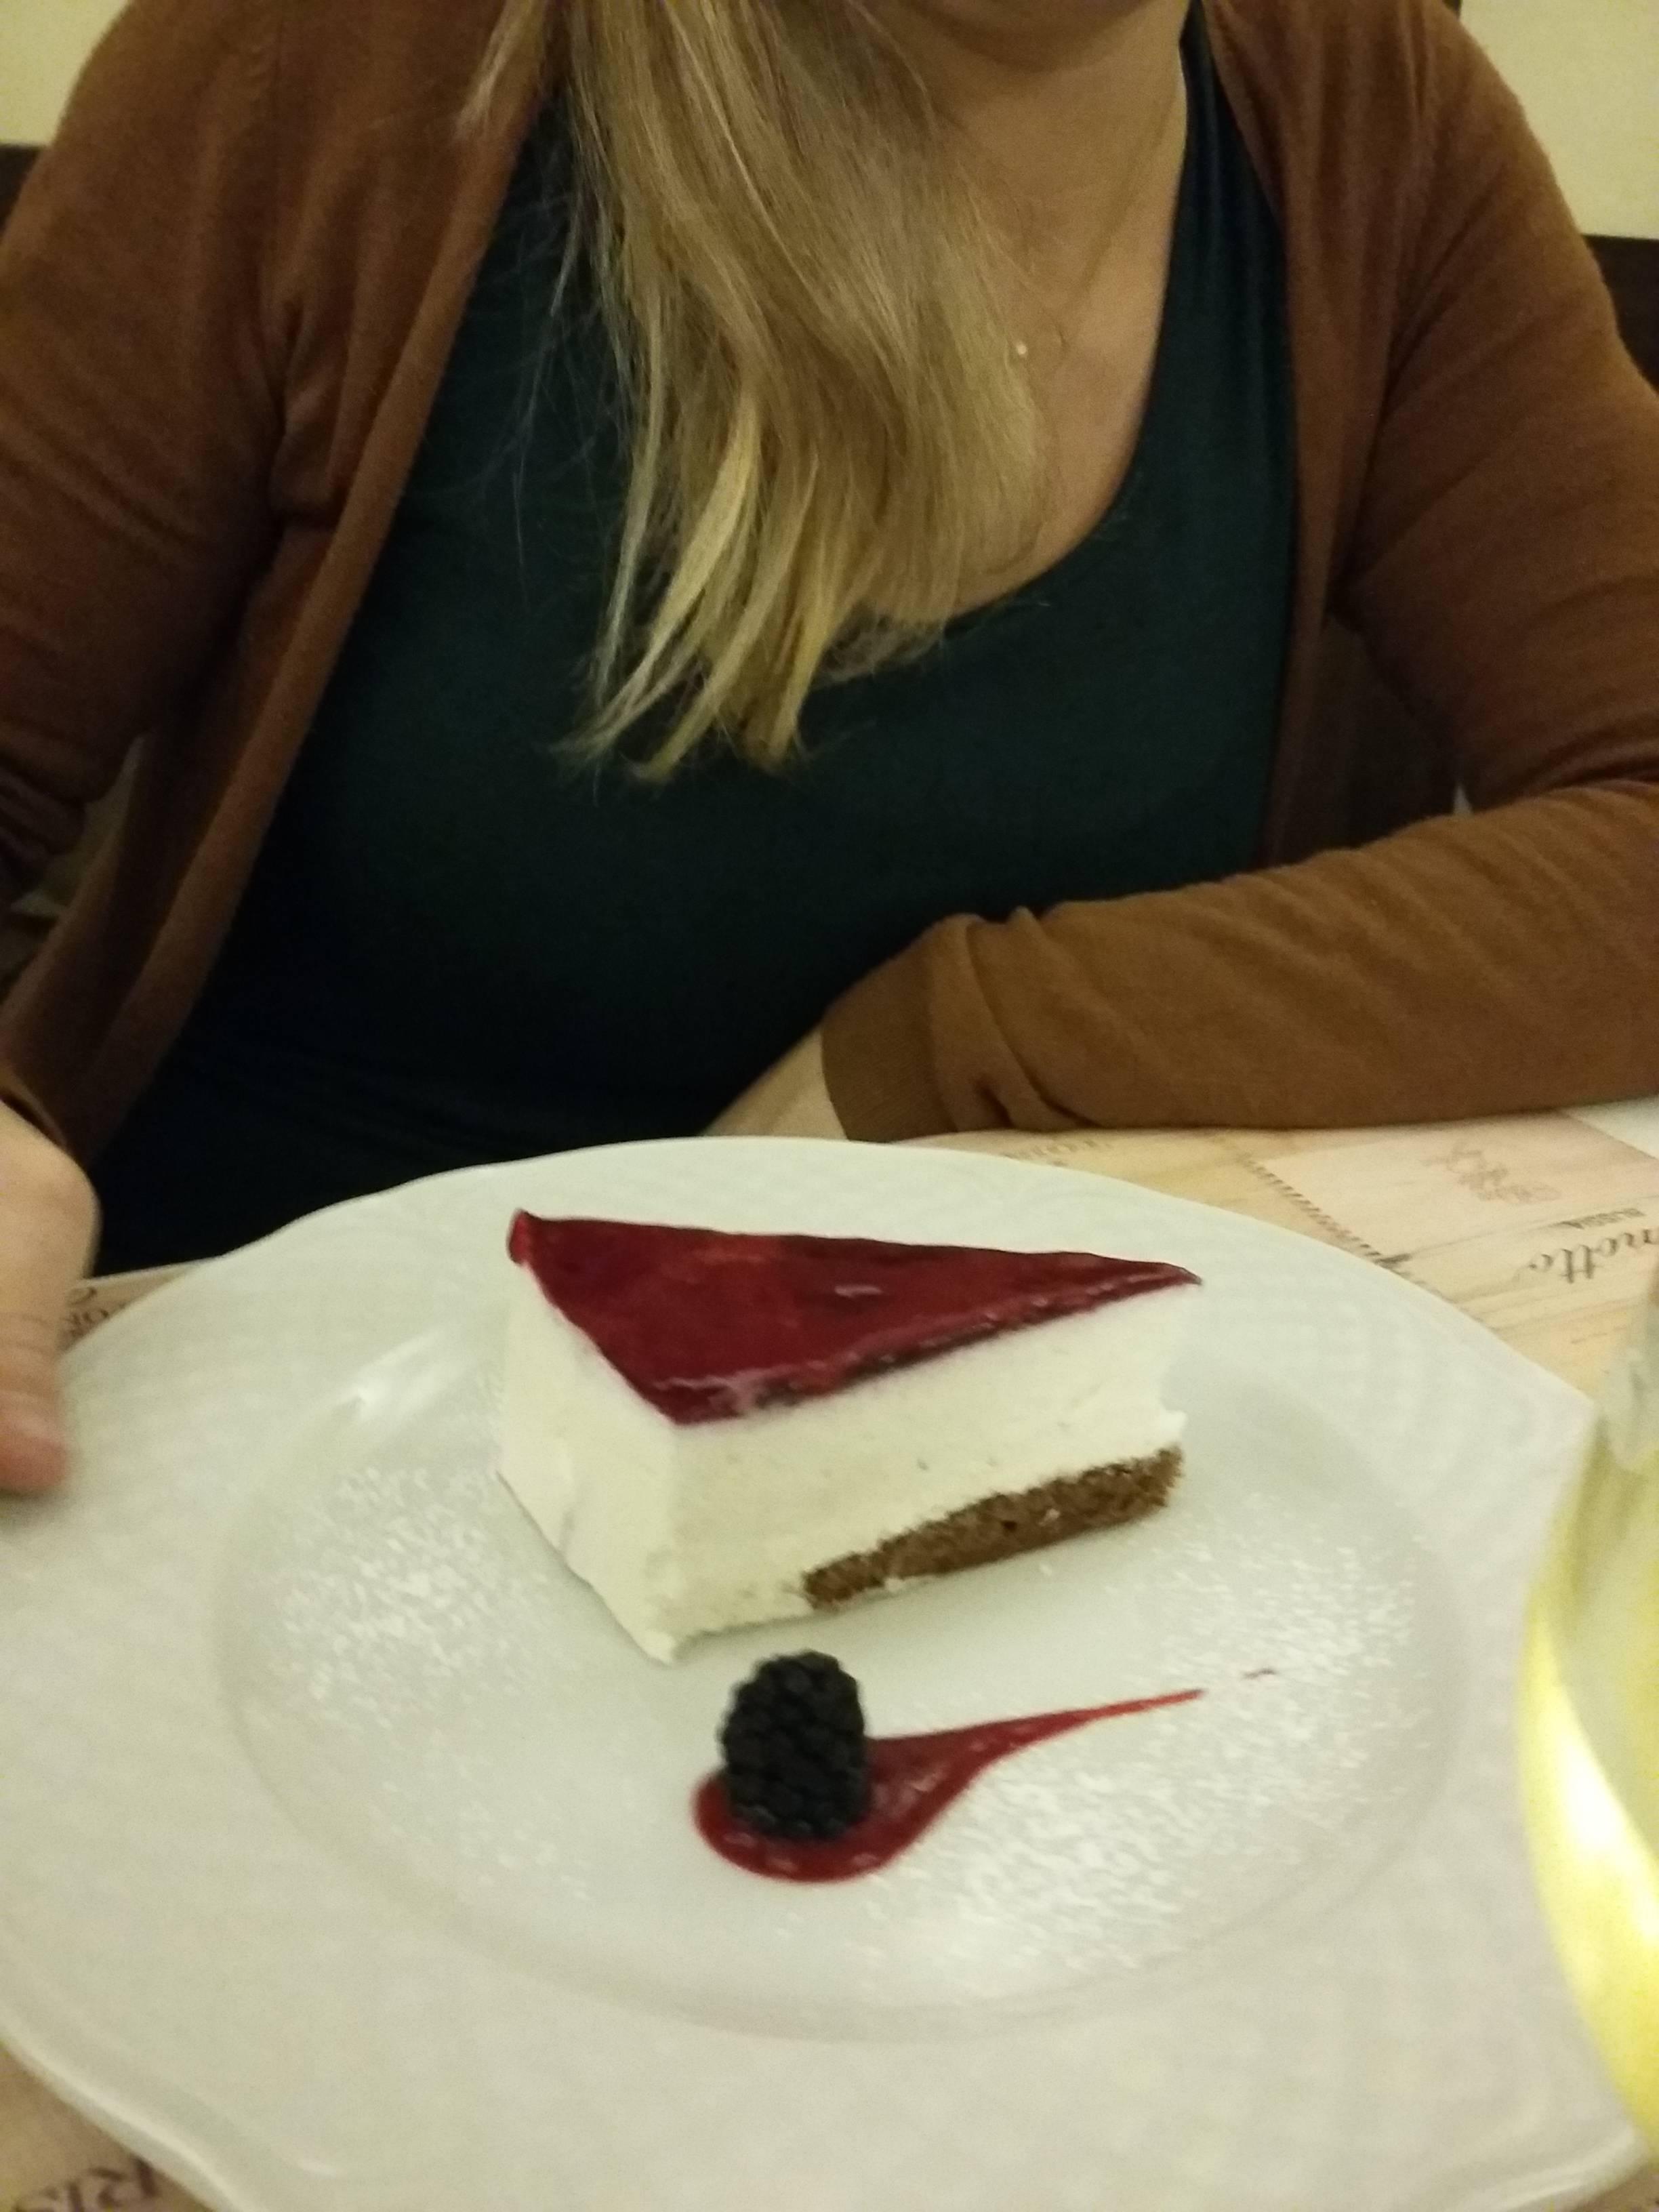 Photo 3: Osteria Barberini, la truffe sous toutes ses formes!